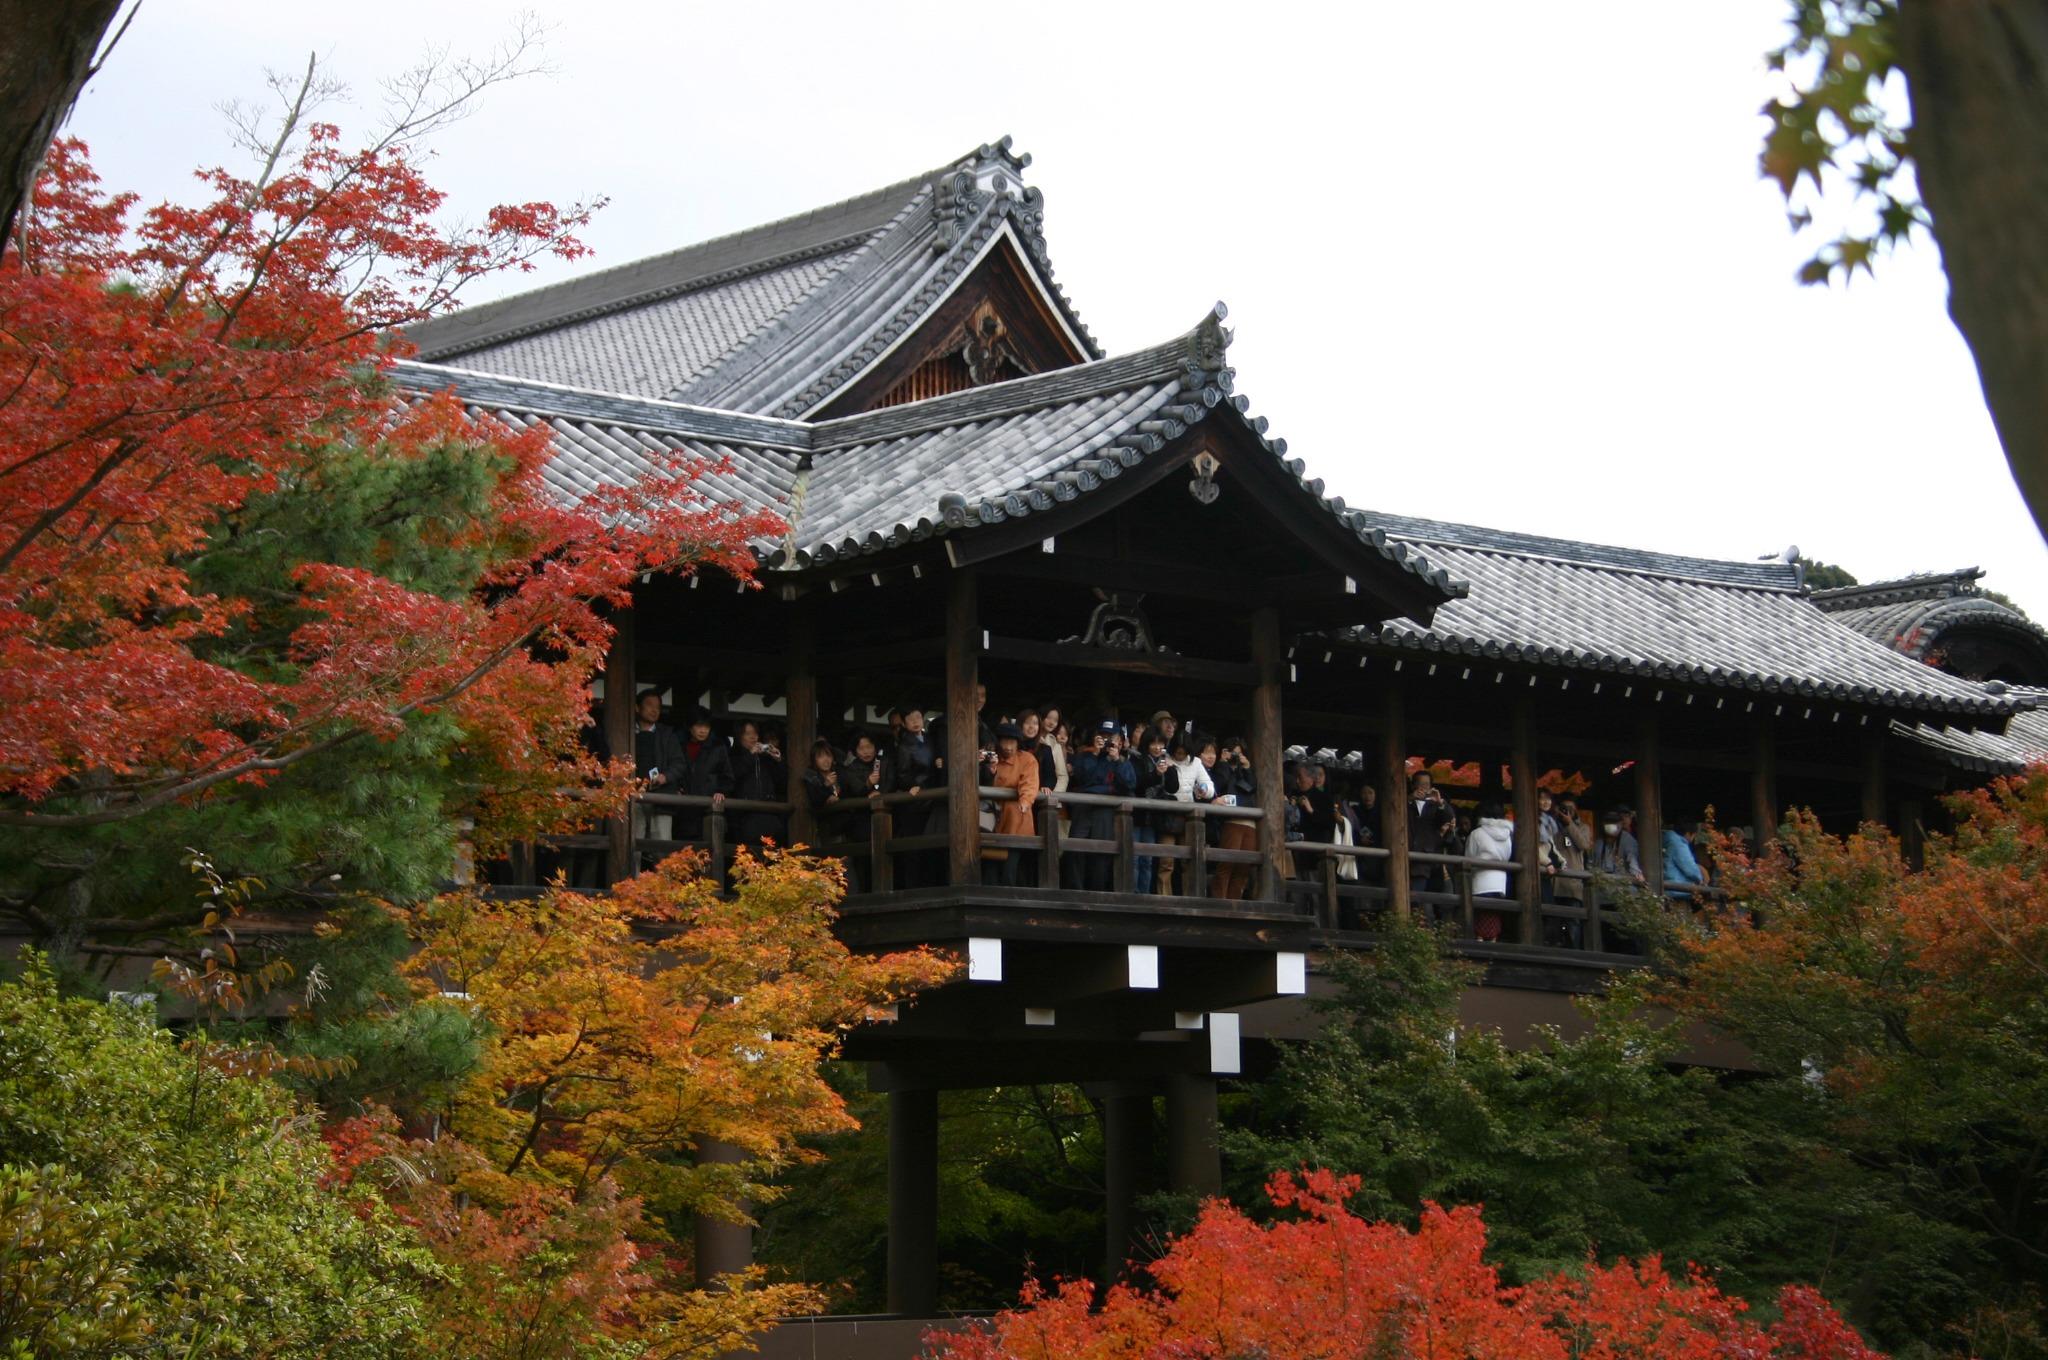 京都の紅葉の名所、東福寺「通天橋」